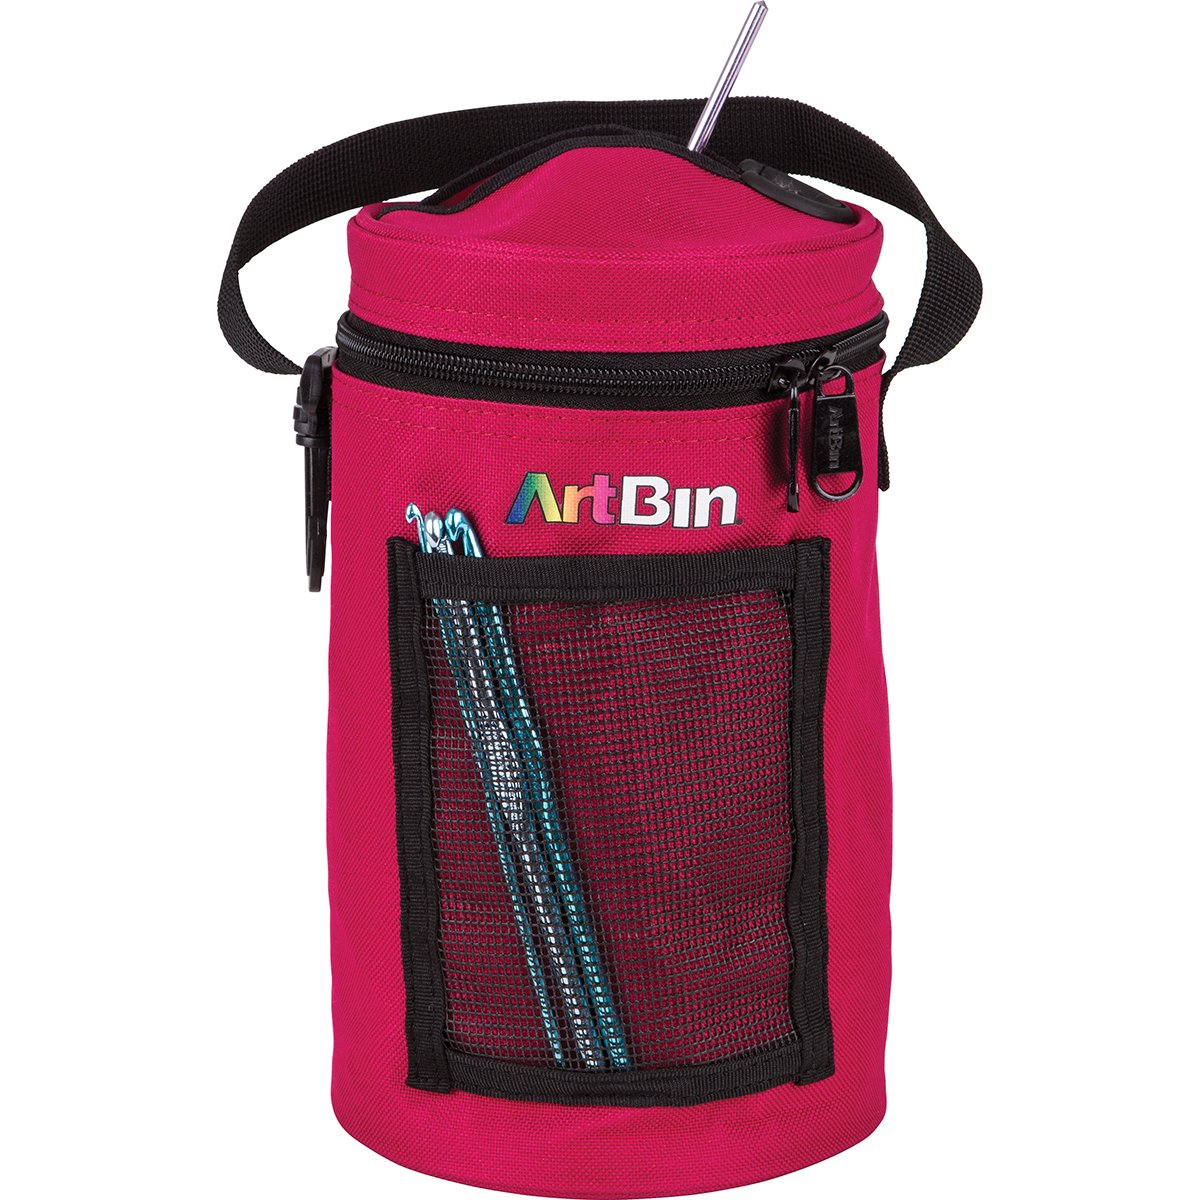 ArtBin Mini Yarn Drum Knitting and Crochet Tote Bag, Raspberry 6831AG,